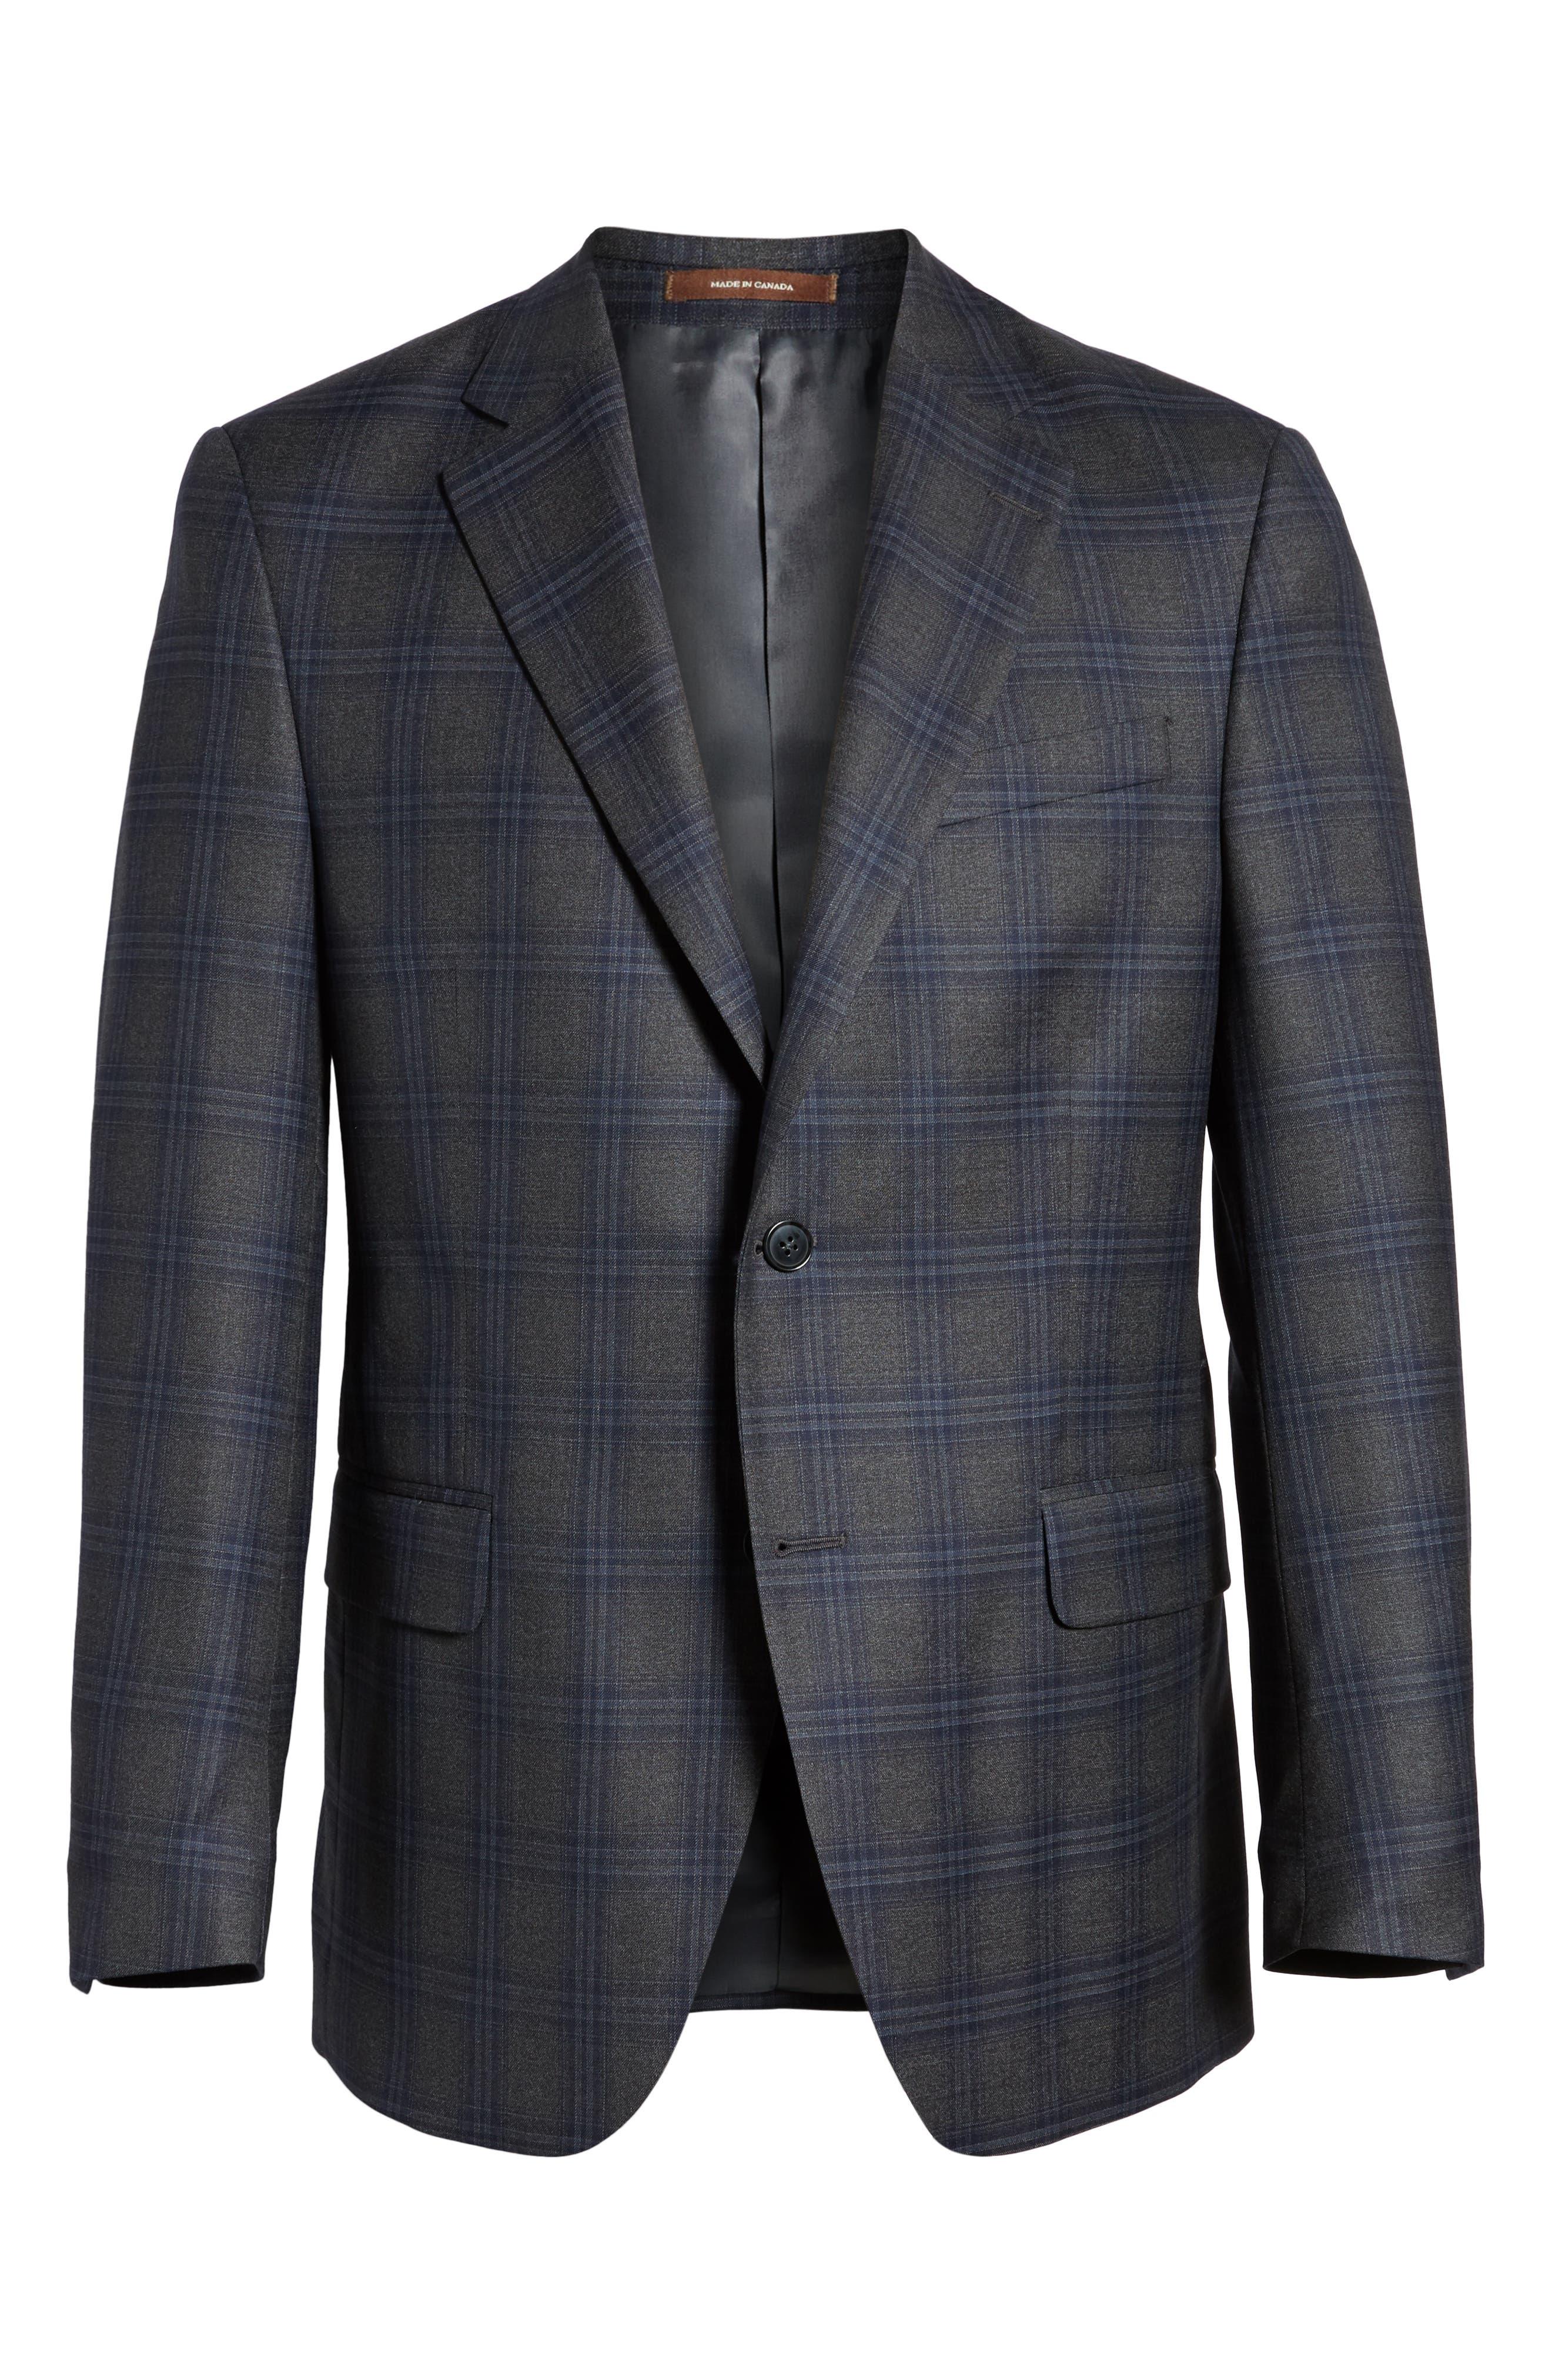 PETER MILLAR,                             Classic Fit Plaid Wool Sport Coat,                             Alternate thumbnail 5, color,                             020